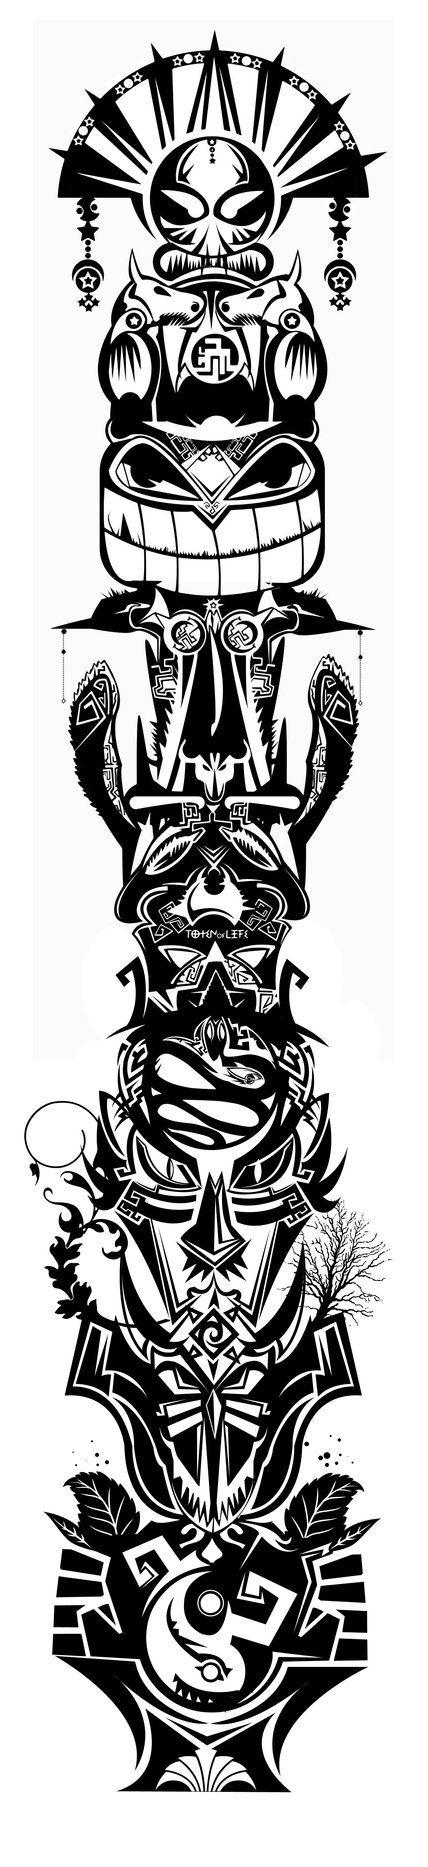 http://th00.deviantart.net/fs70/PRE/f/2010/007/5/d/Totem_da_Vida___II_by_luh_yart.jpg